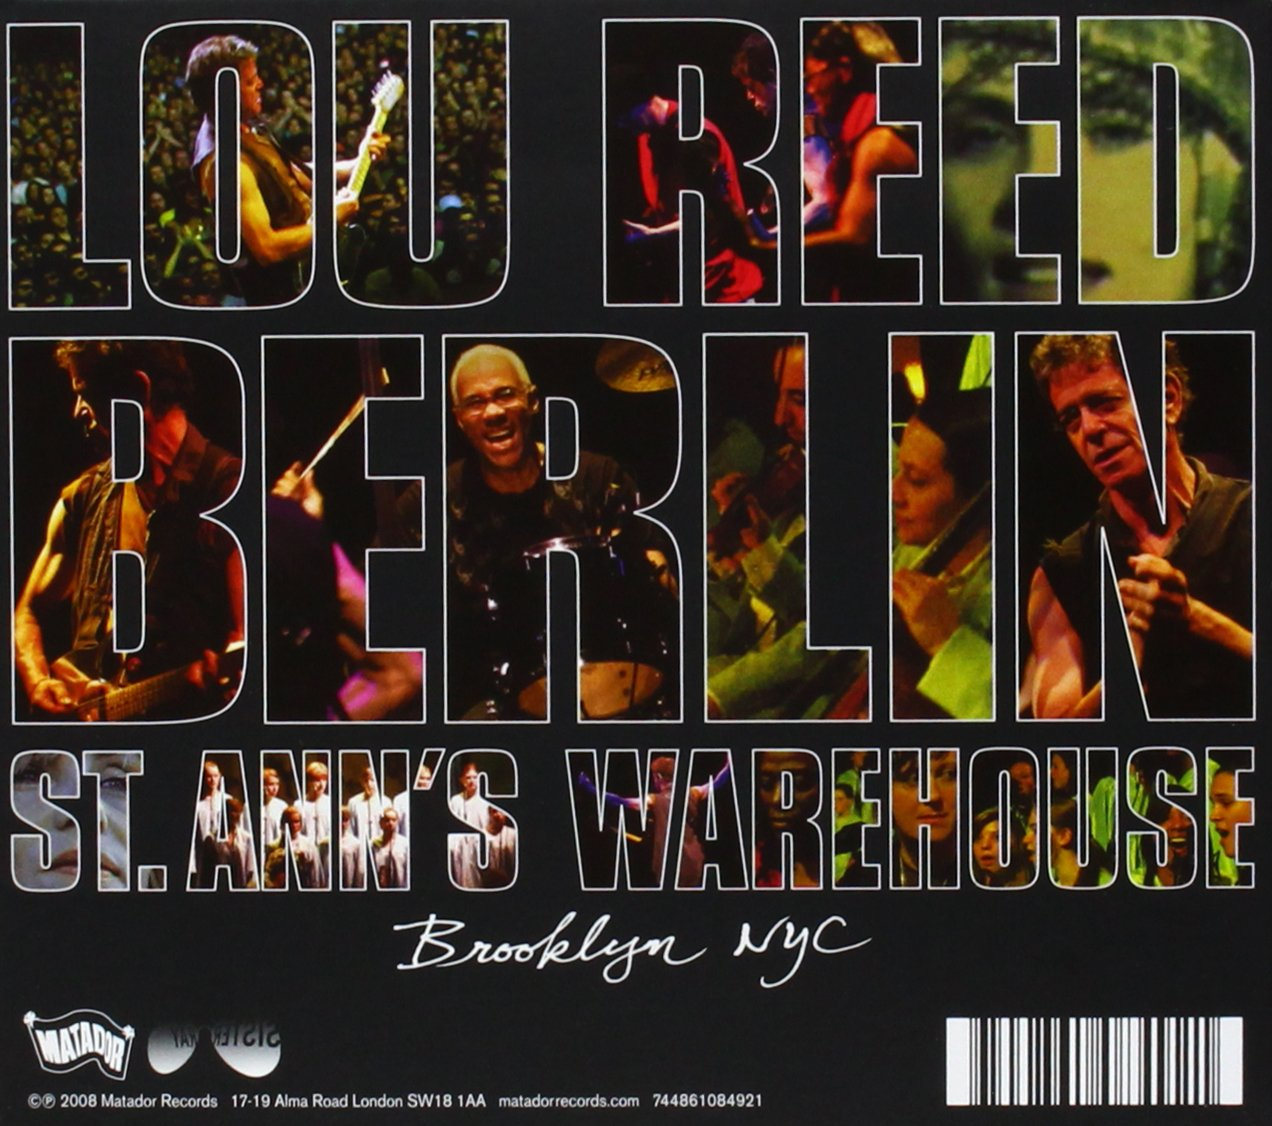 Berlin: Live at St. Ann's Warehouse